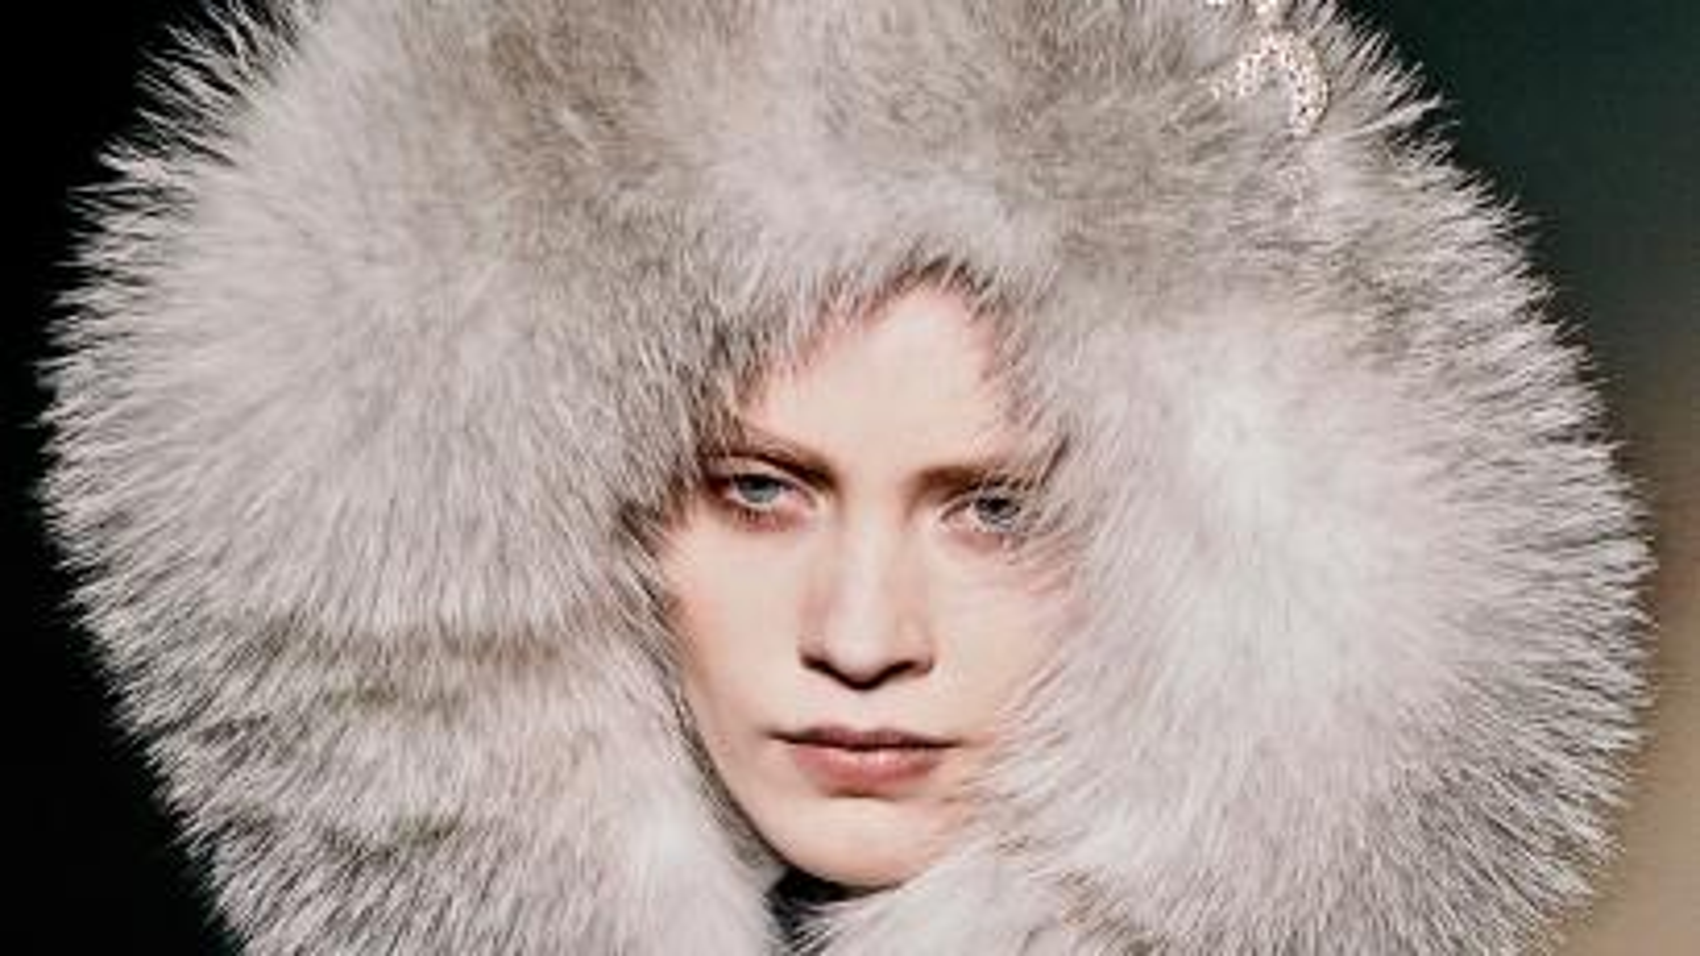 A Jean-Paul Gaultier fur design for Hermes.